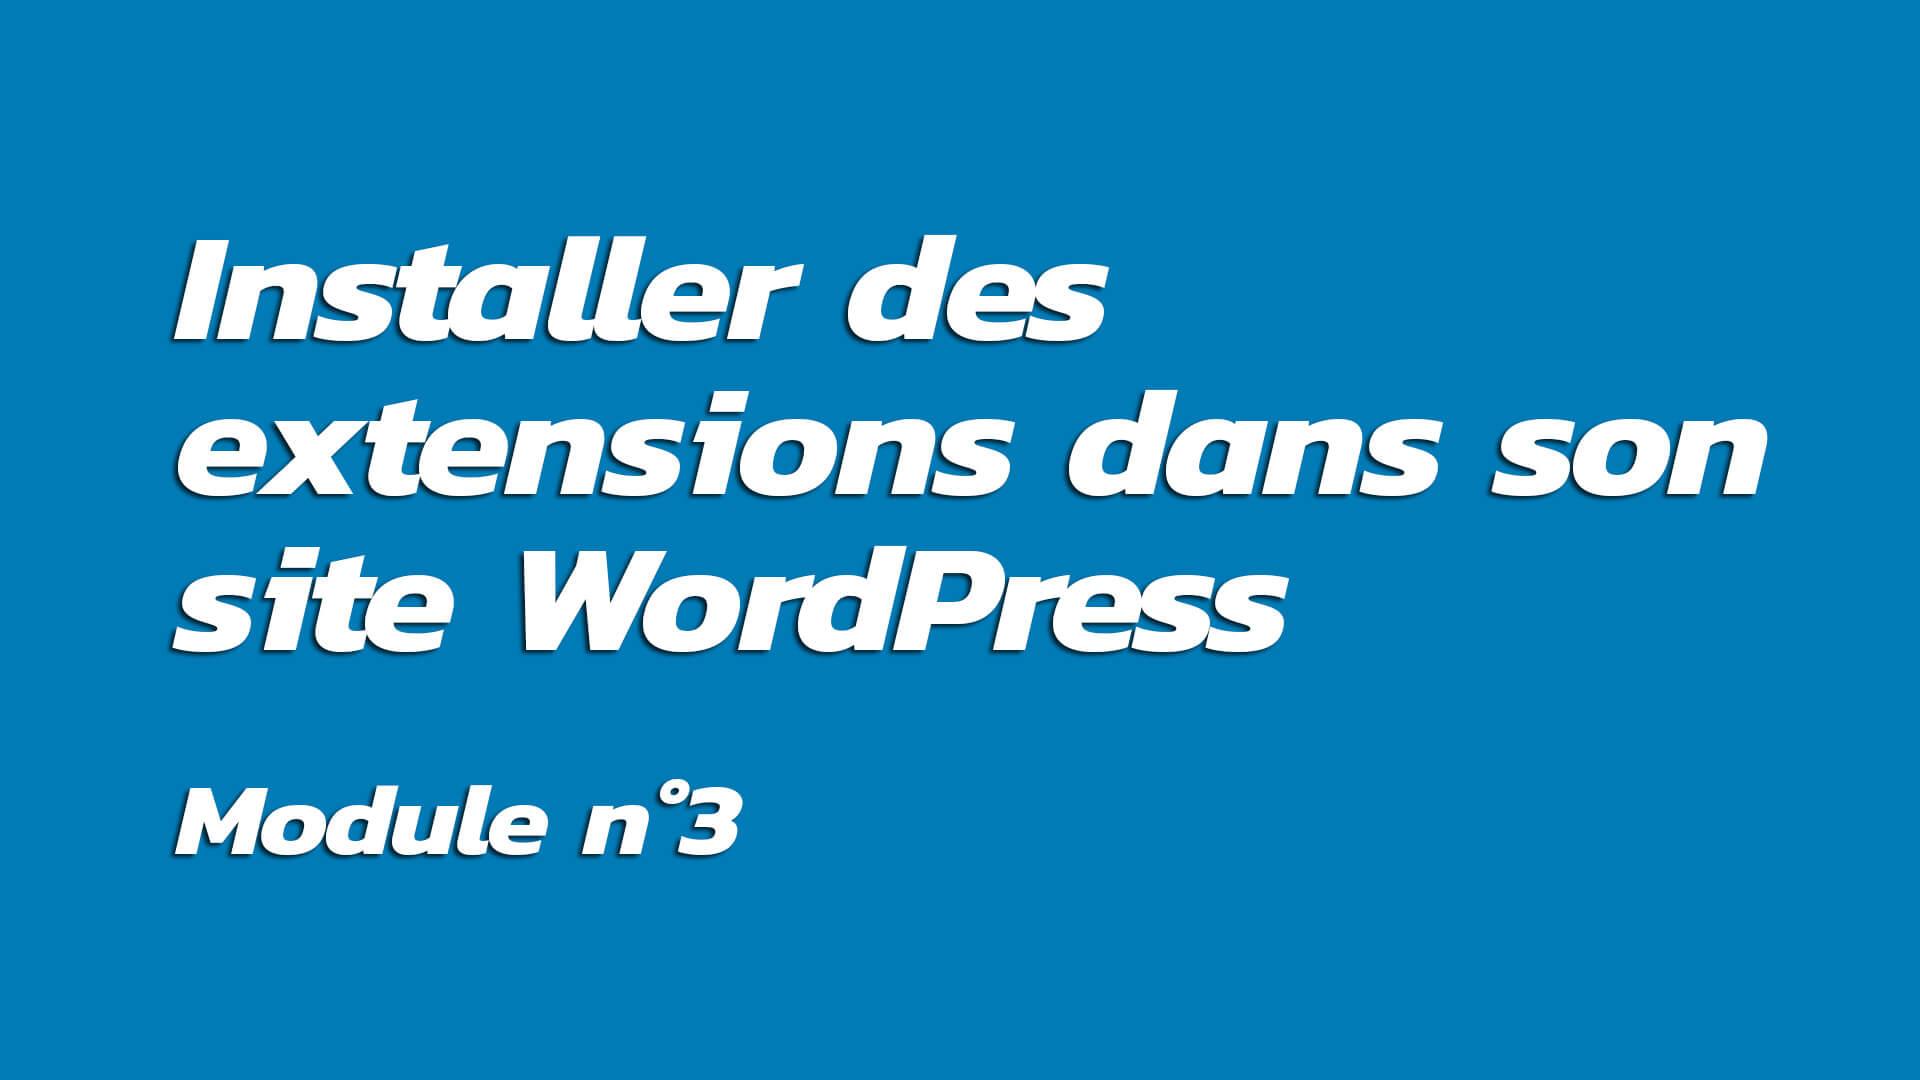 Formation : Installer des extensions dans son site WordPress